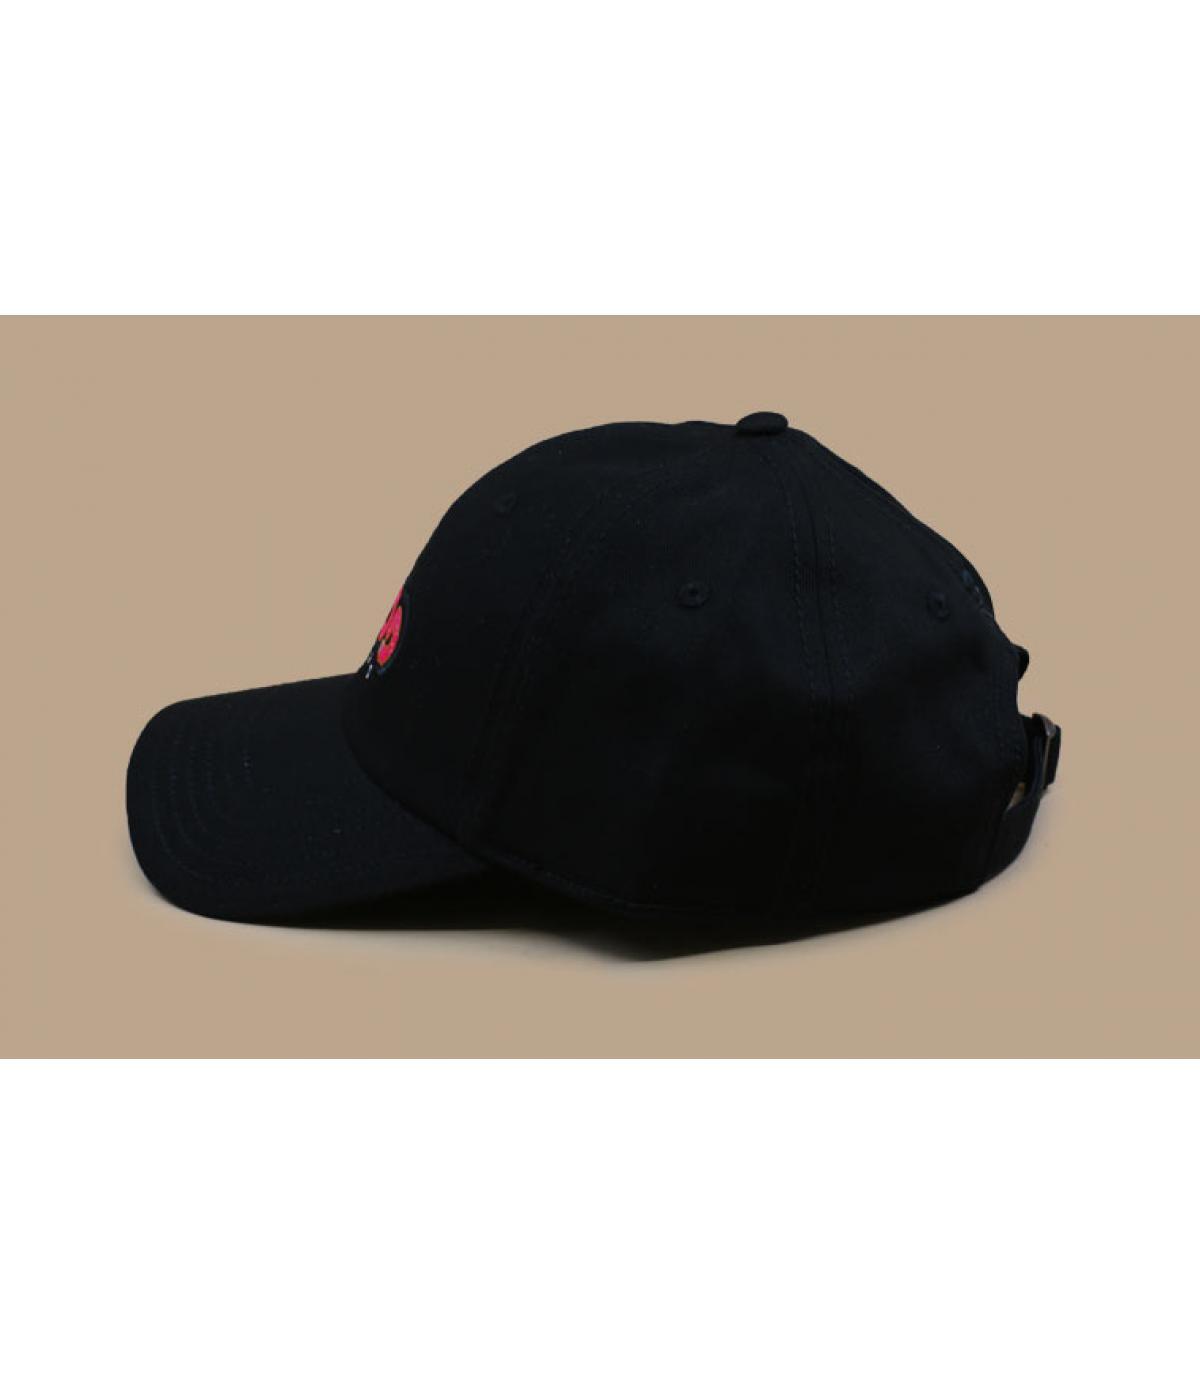 Details Munchies Times Curved Cap black - Abbildung 4